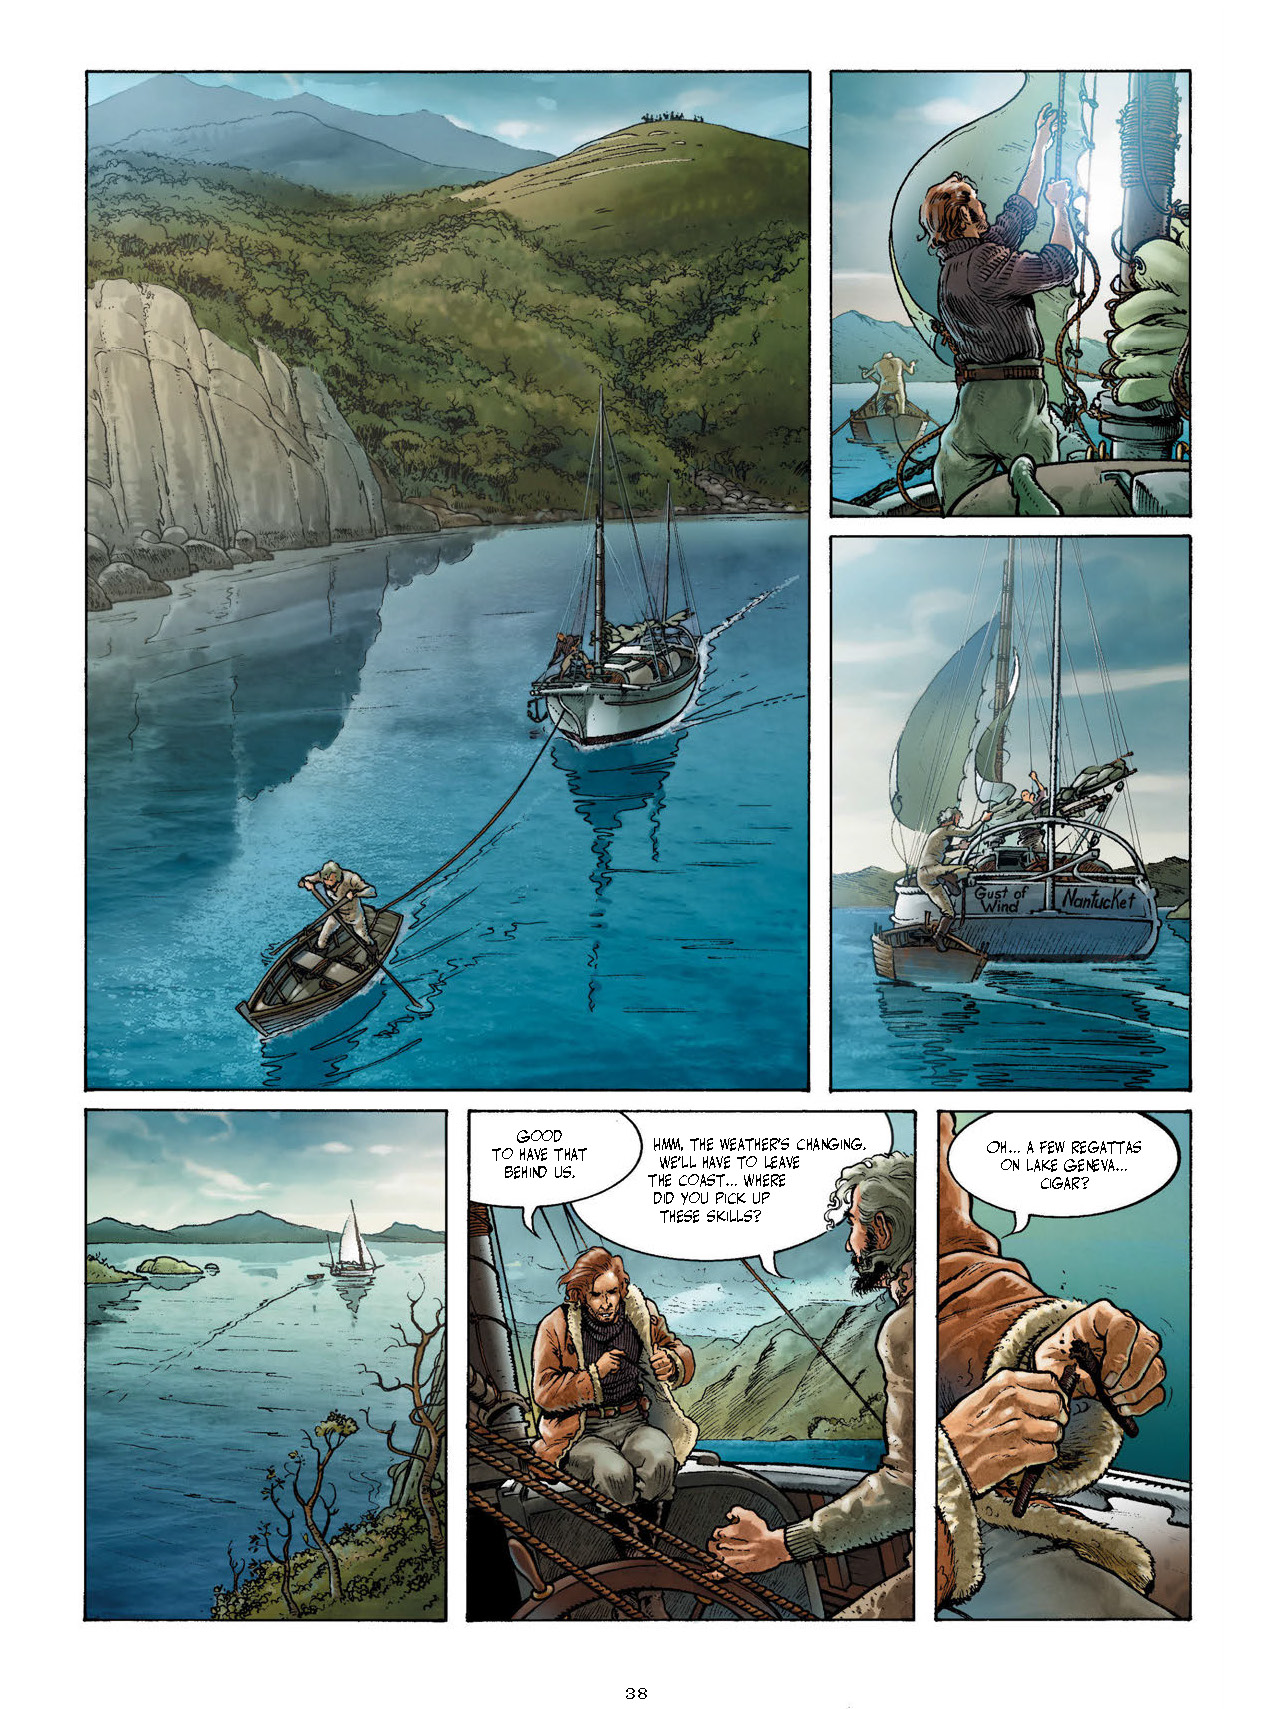 Cape Horn graphic novel review